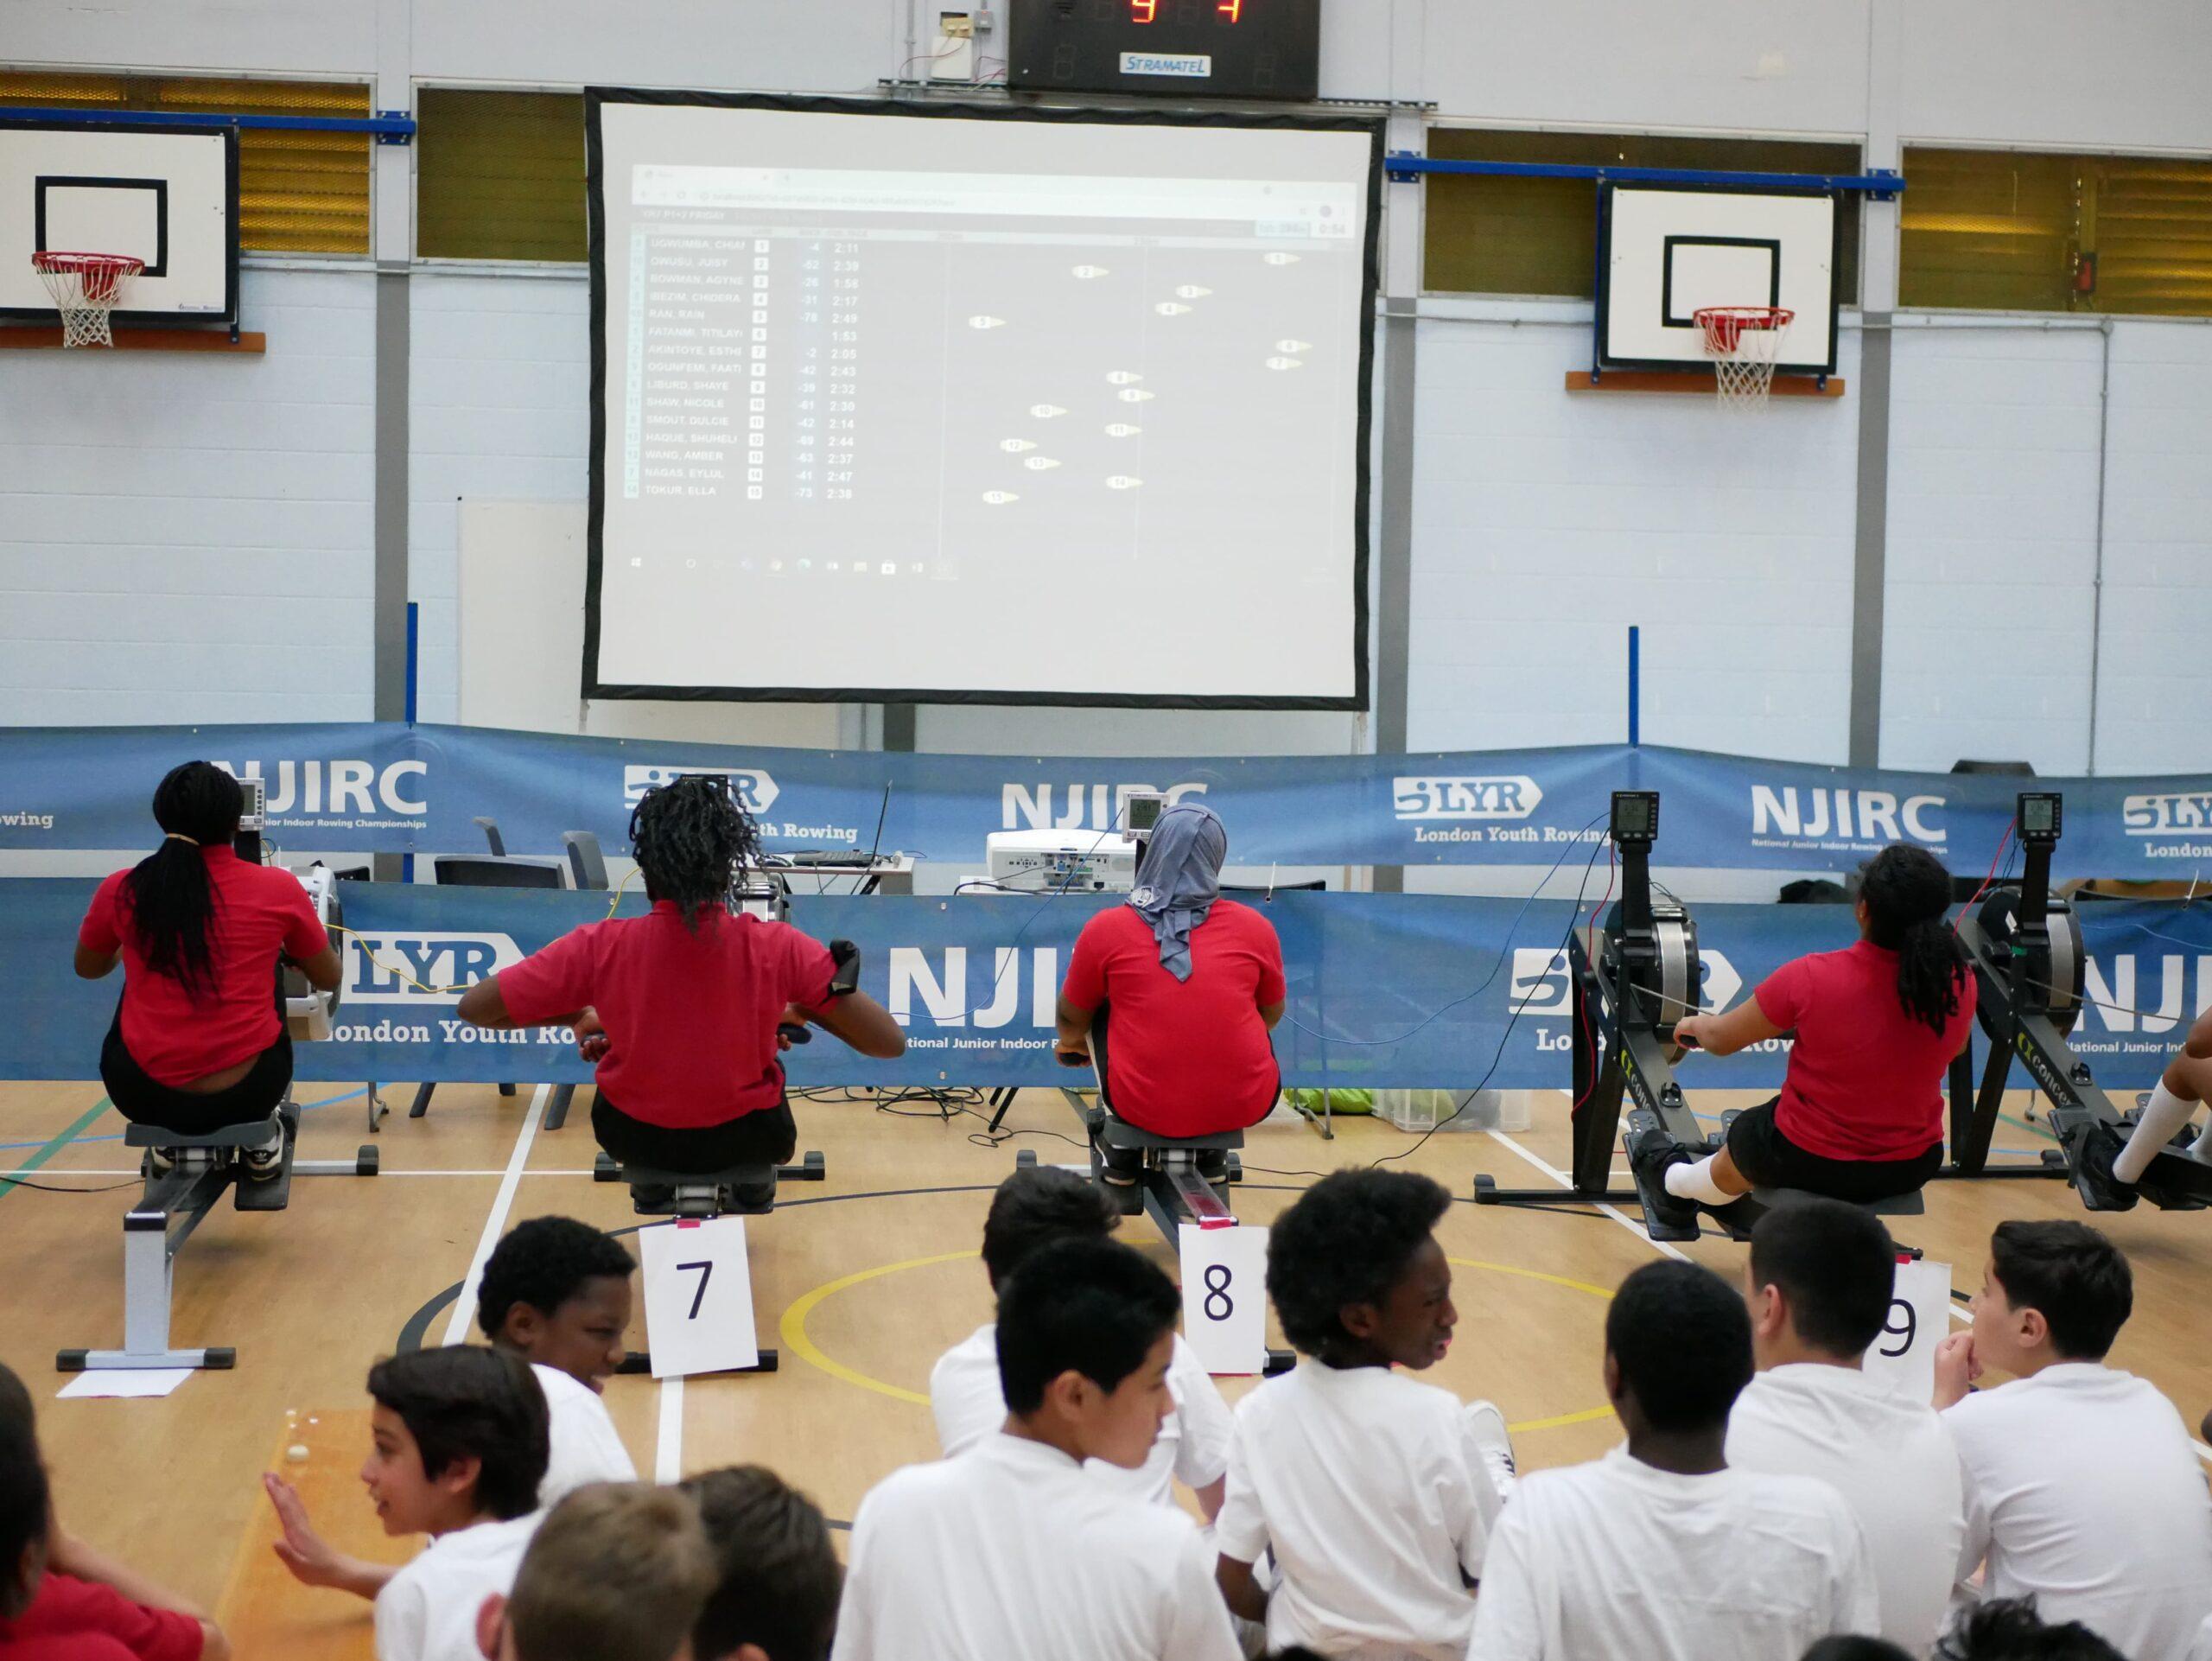 2021 National Junior Indoor Rowing Championship